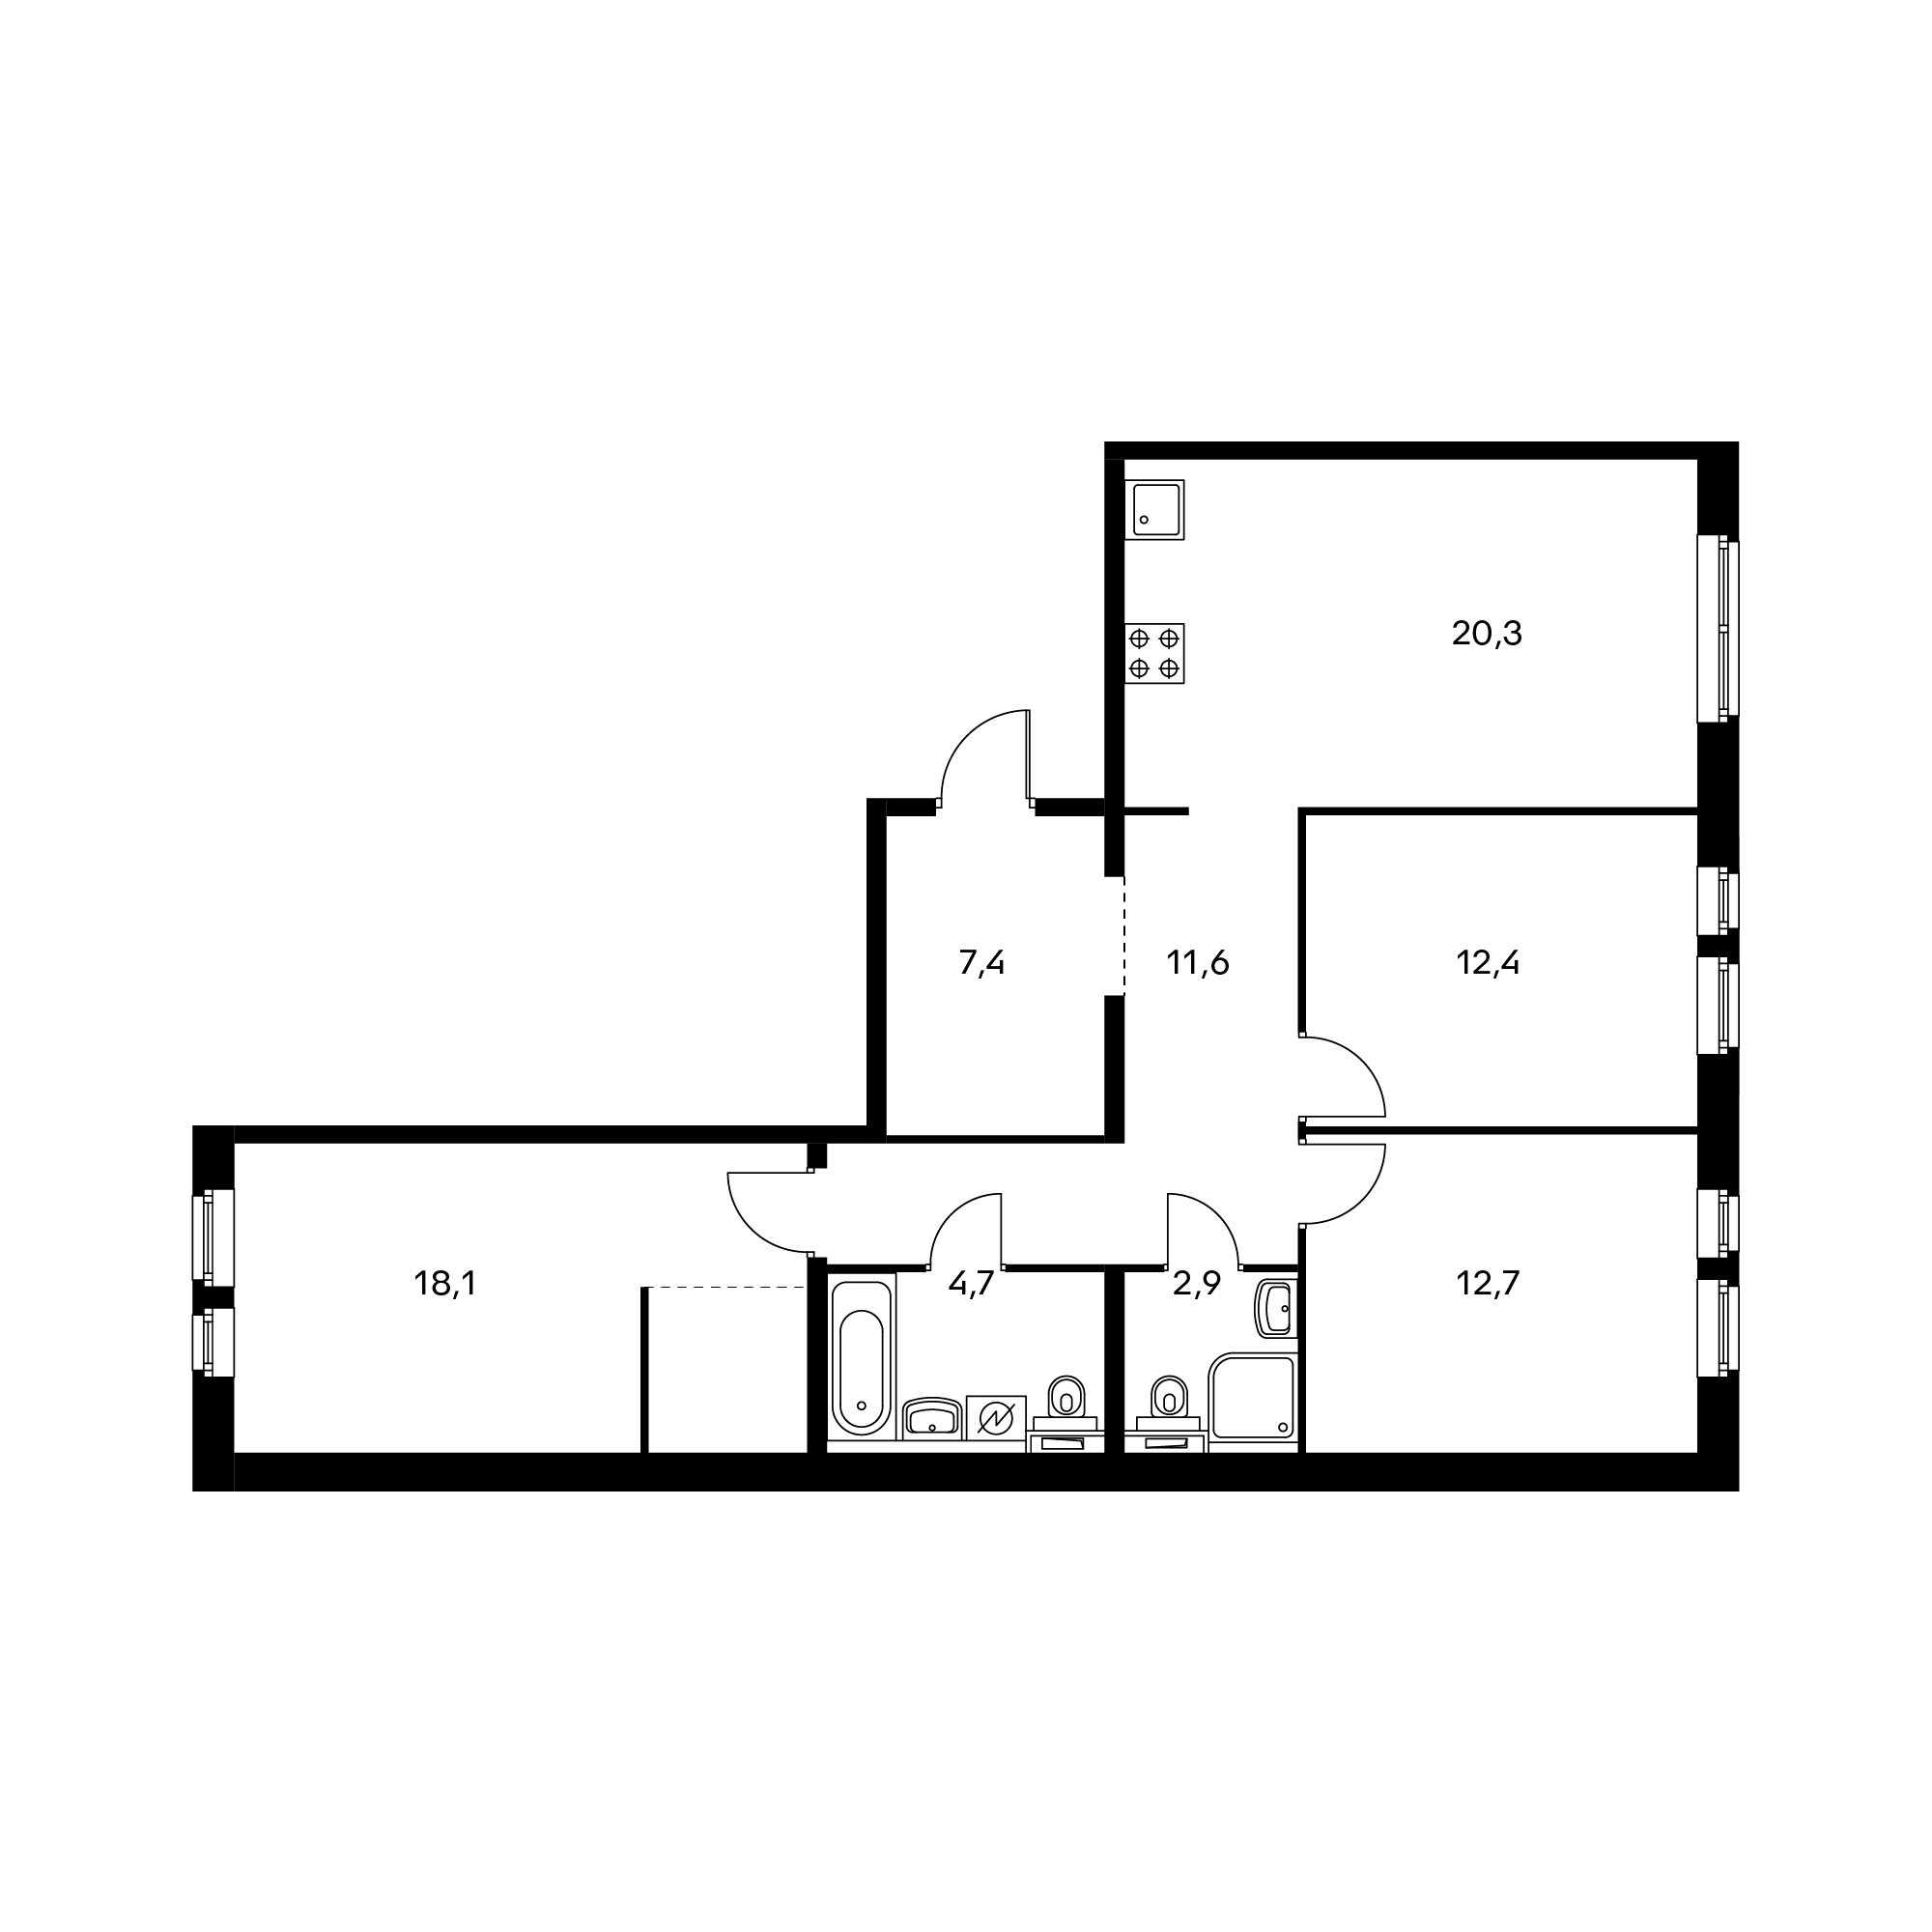 3EL3_10.2-3